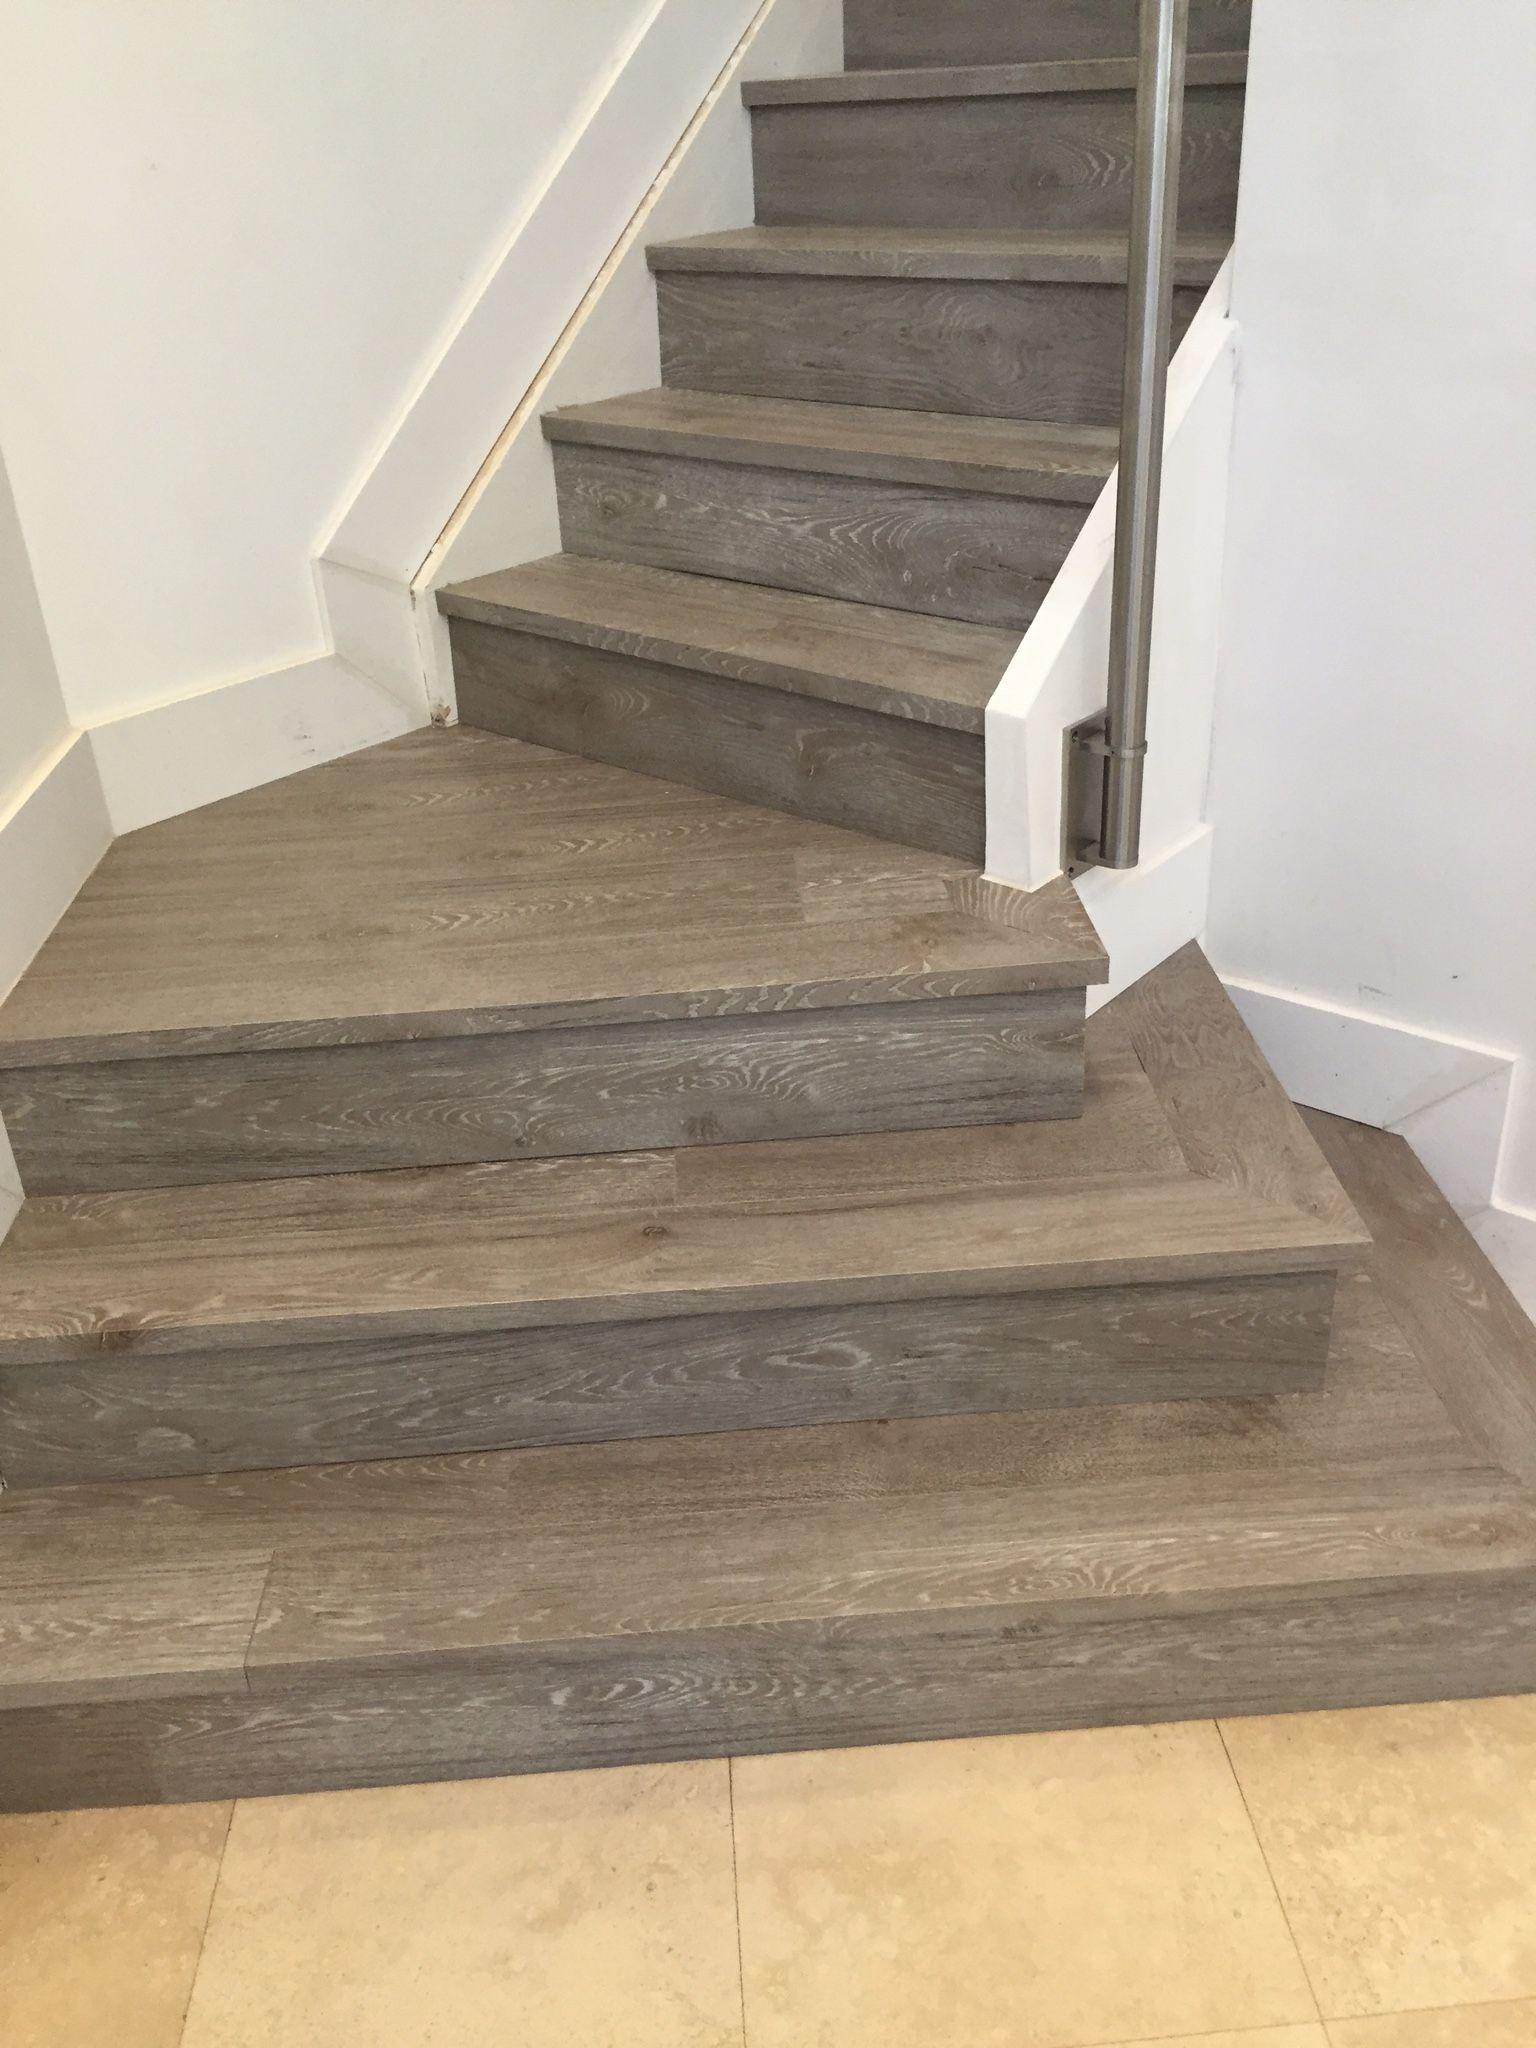 Pin By Jv Wood Floors On Laminate Flooring Stairs Laminate Flooring On Stairs Laminate Flooring Flooring